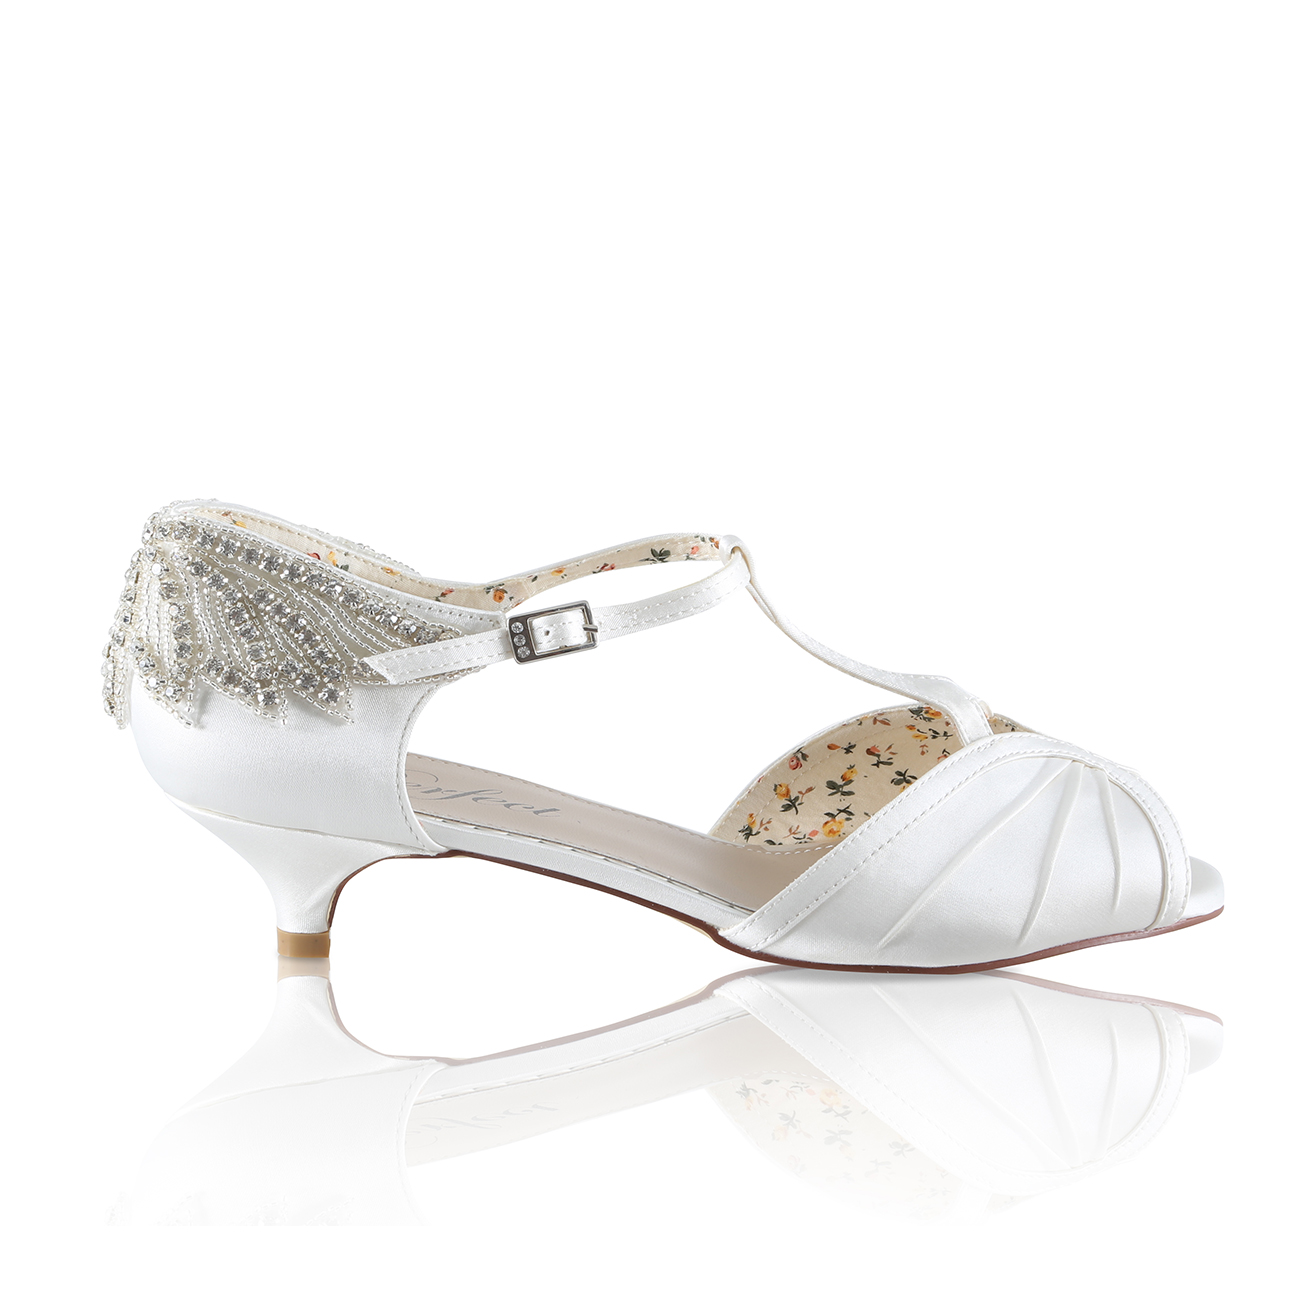 e4f4a5fada8 Rosetta art deco styled peep toe kitten heel bridal shoe